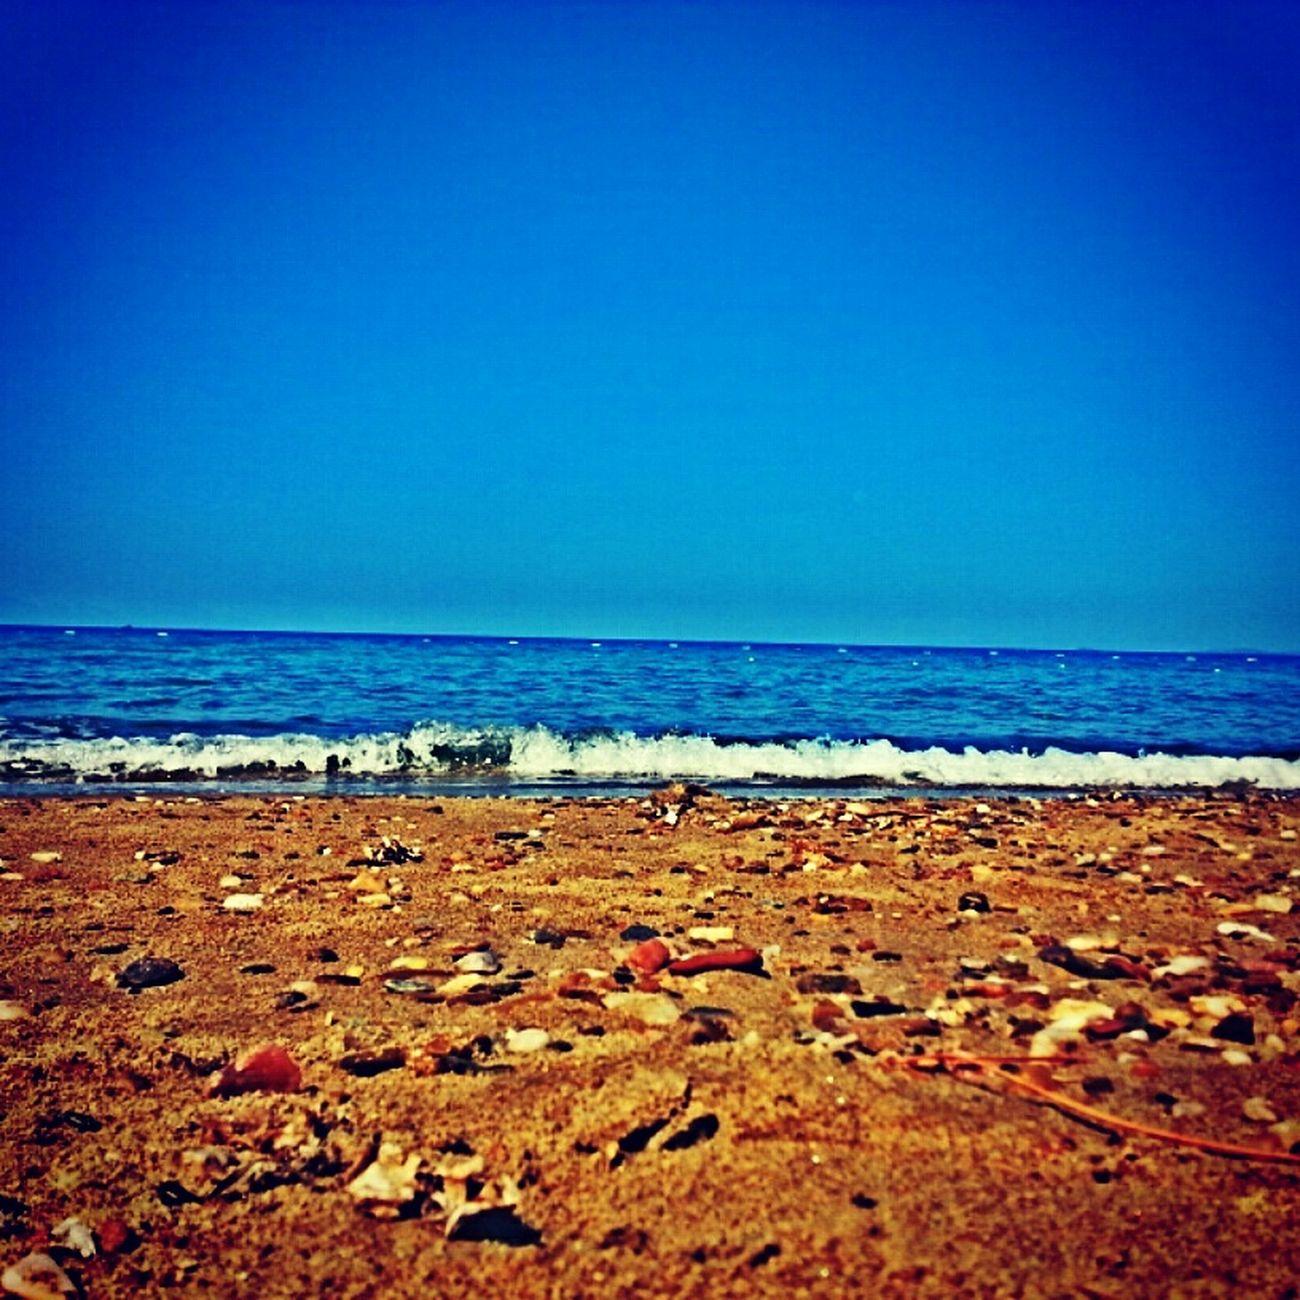 Deniz Kum Gunes Ozdere